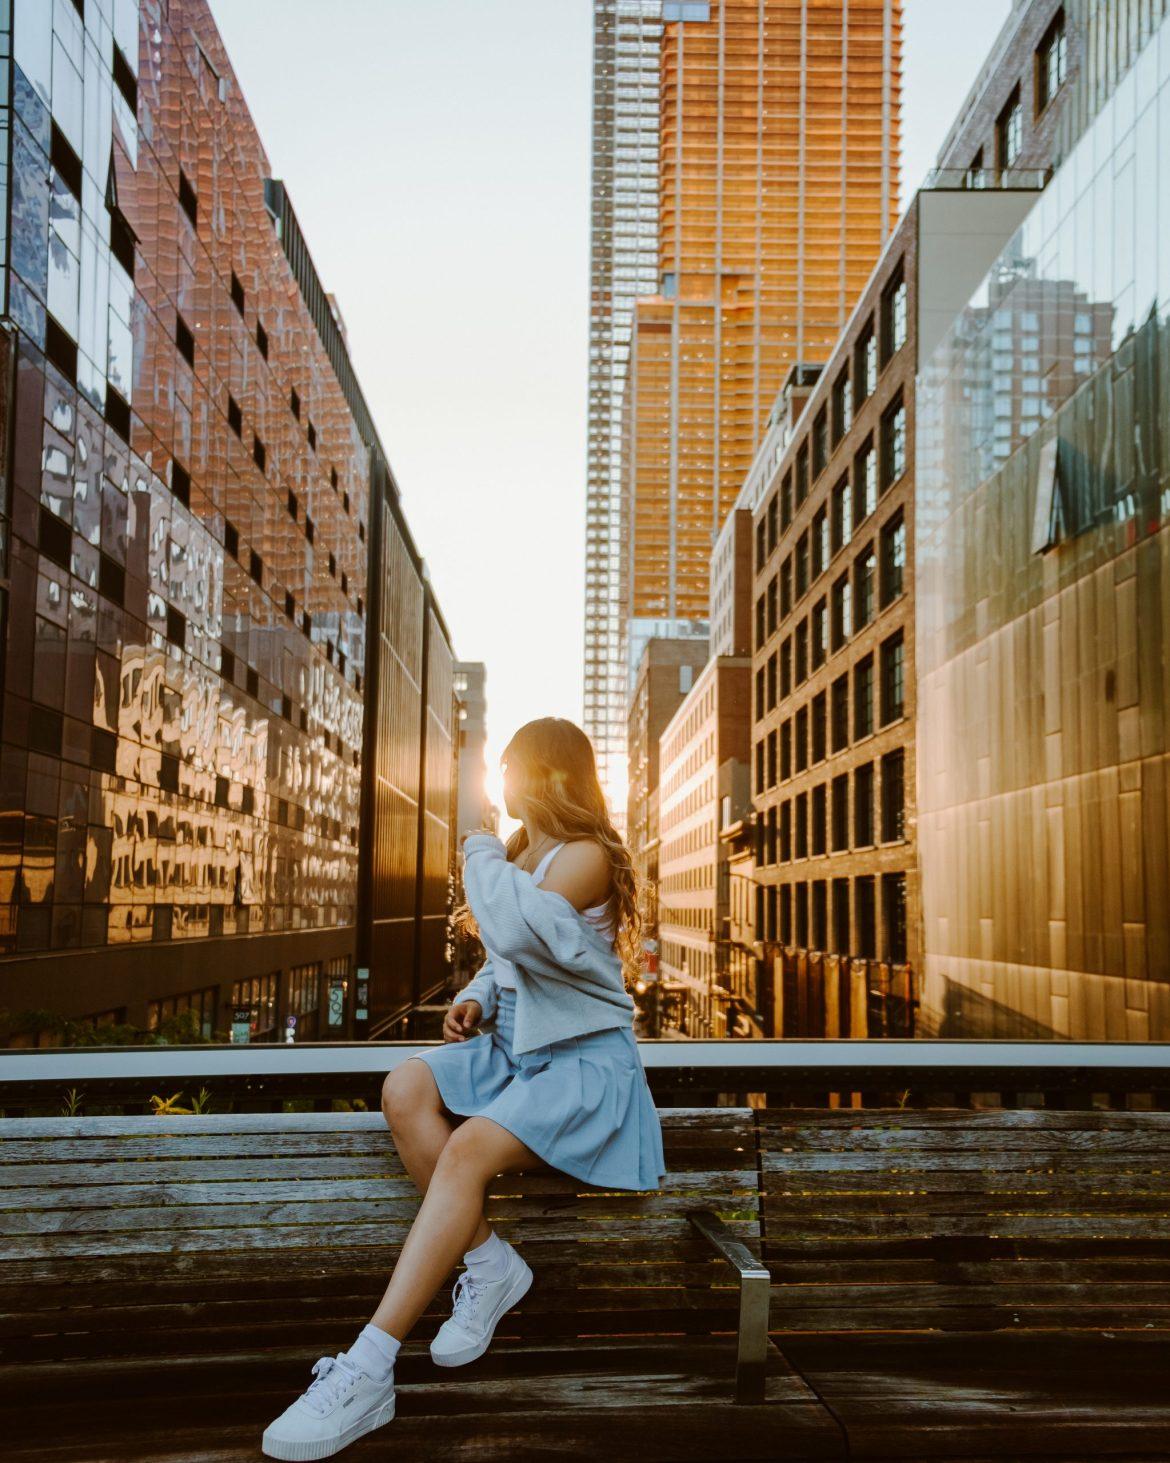 17 Best Instagram Worthy Spots in New York | The High Line